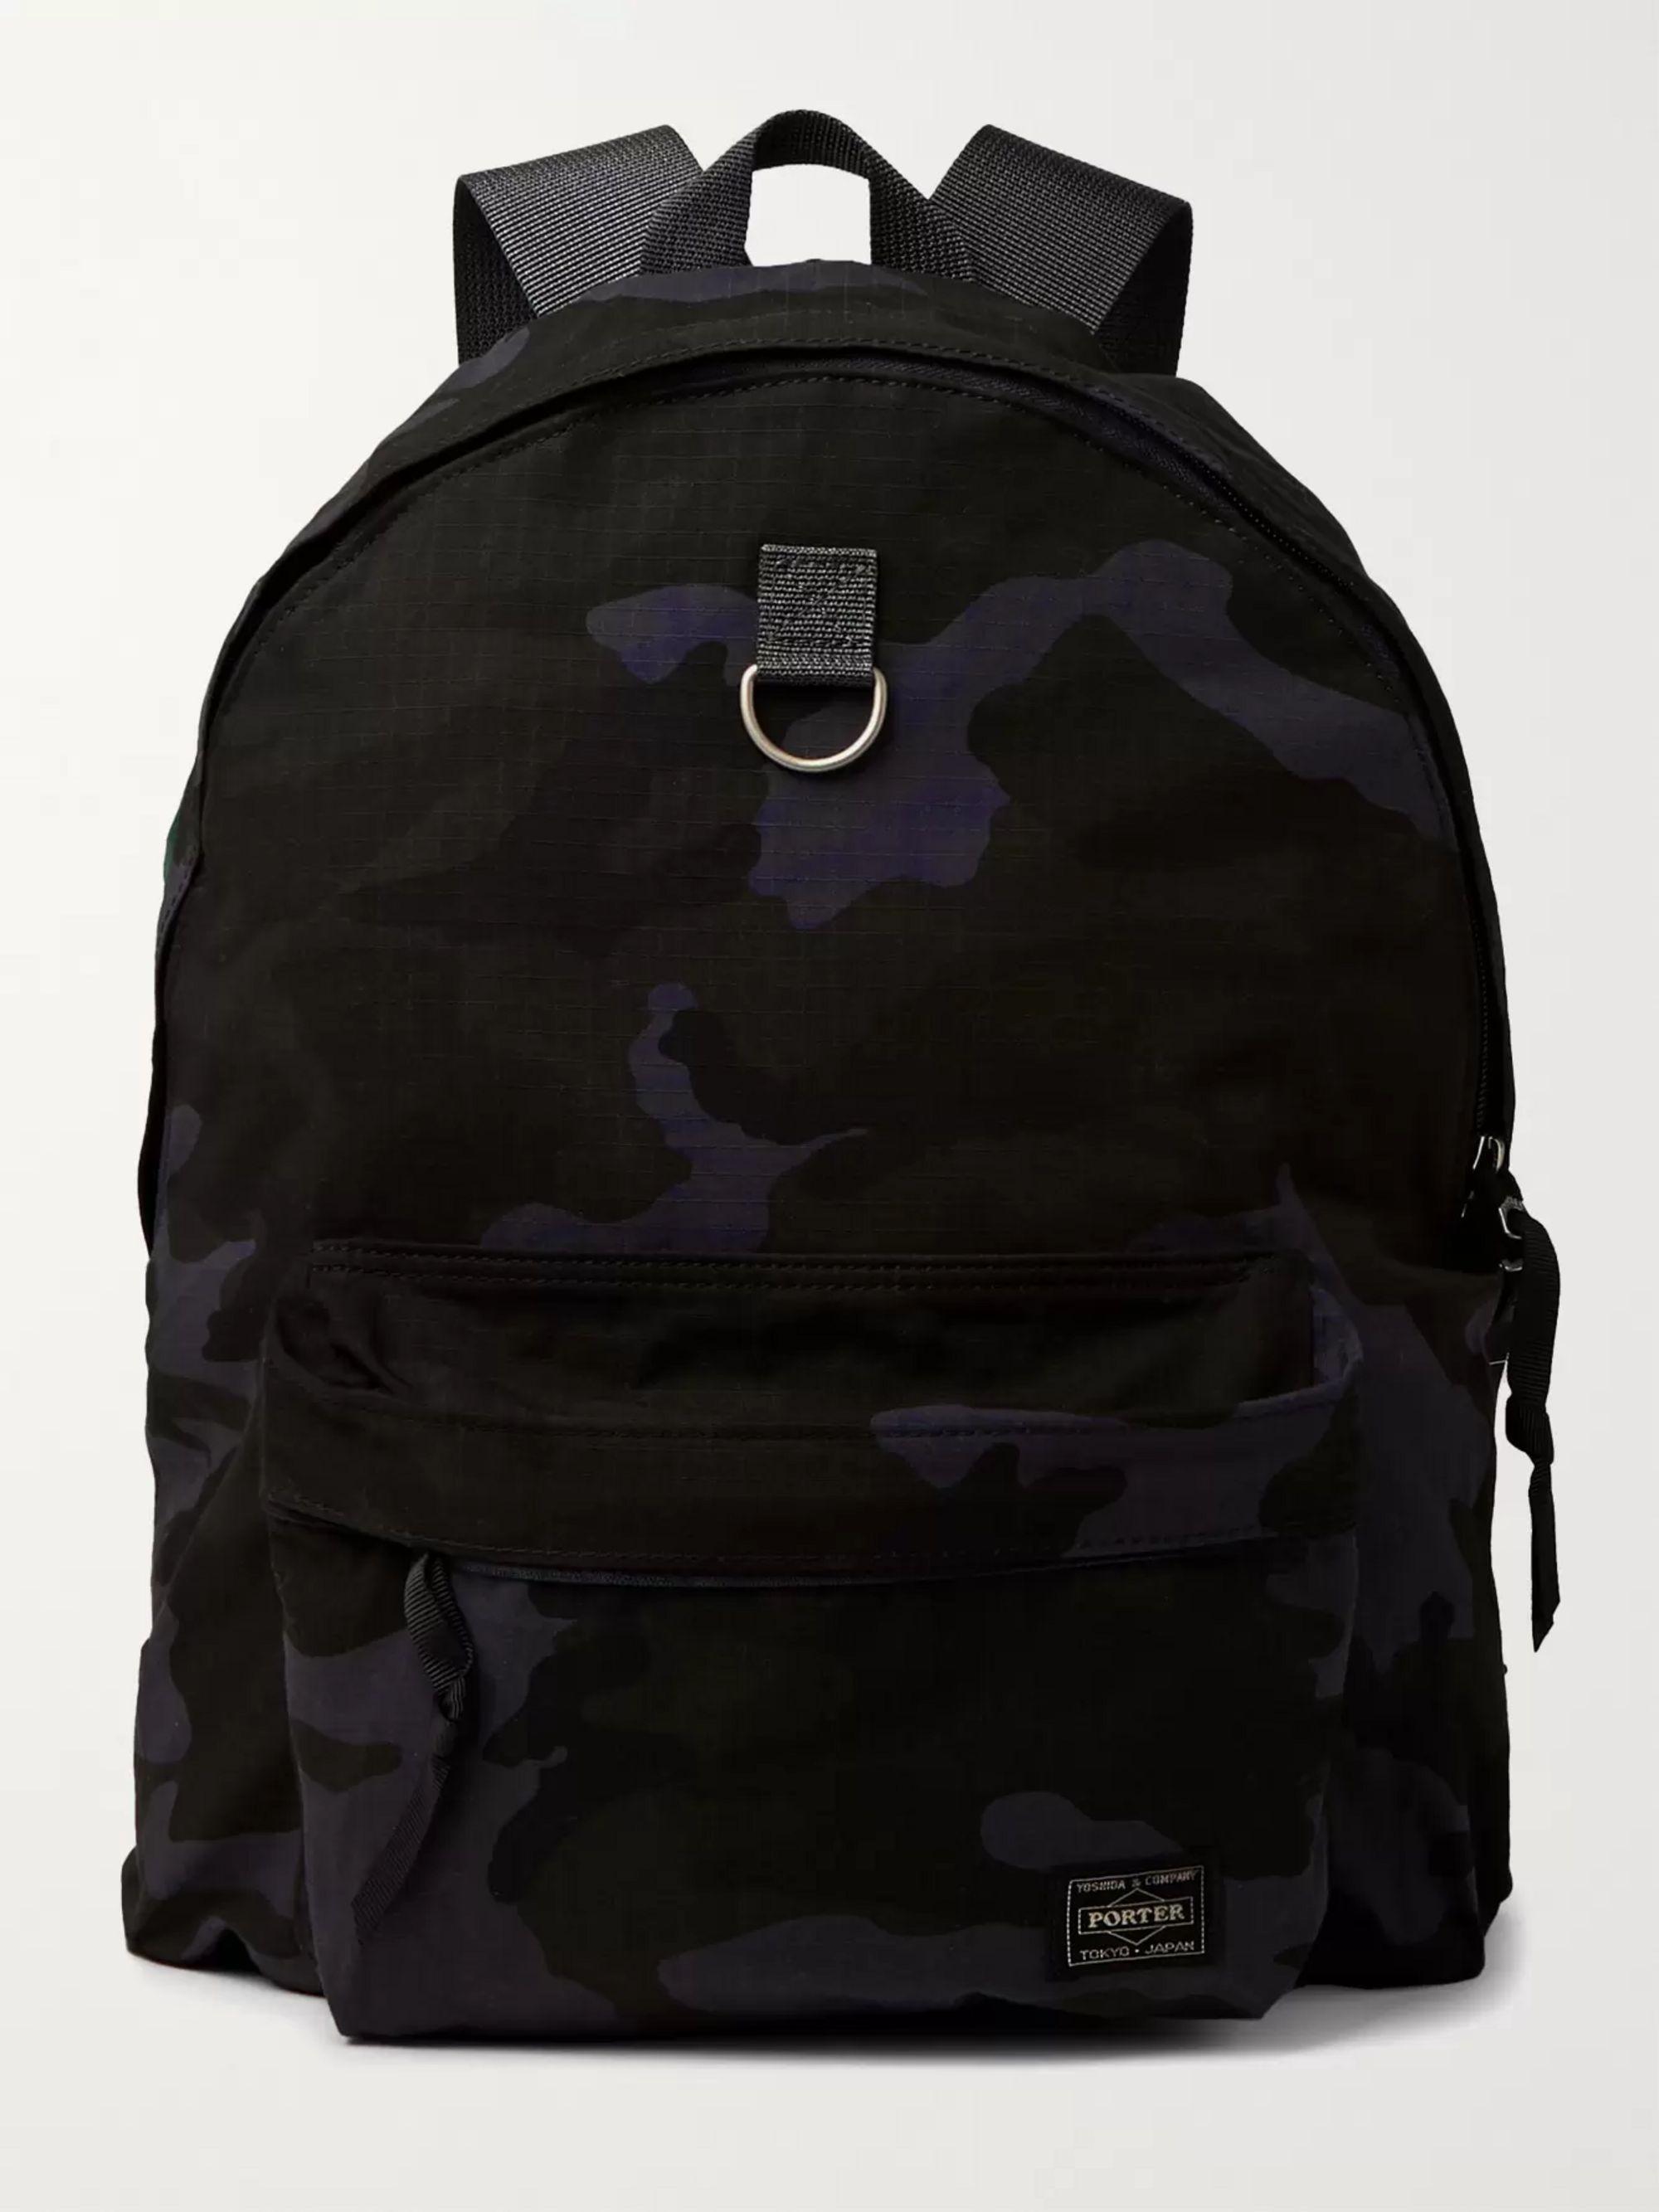 PORTER-YOSHIDA & CO Camouflage-Print Cordura Nylon and Cotton-Ripstop Backpack,Navy